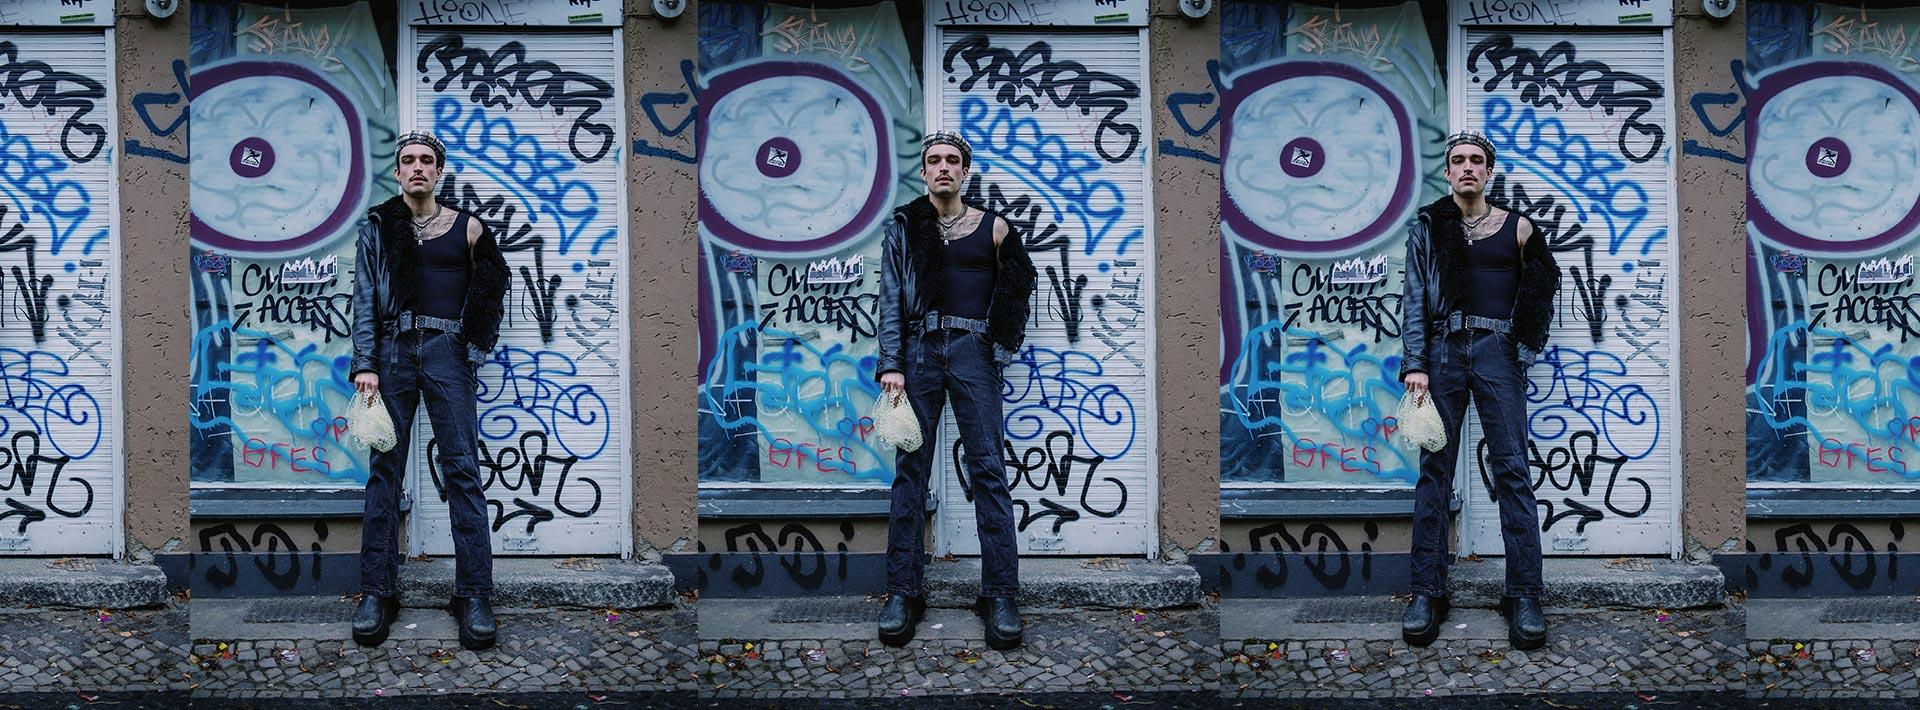 Berlin nightclub kinda life